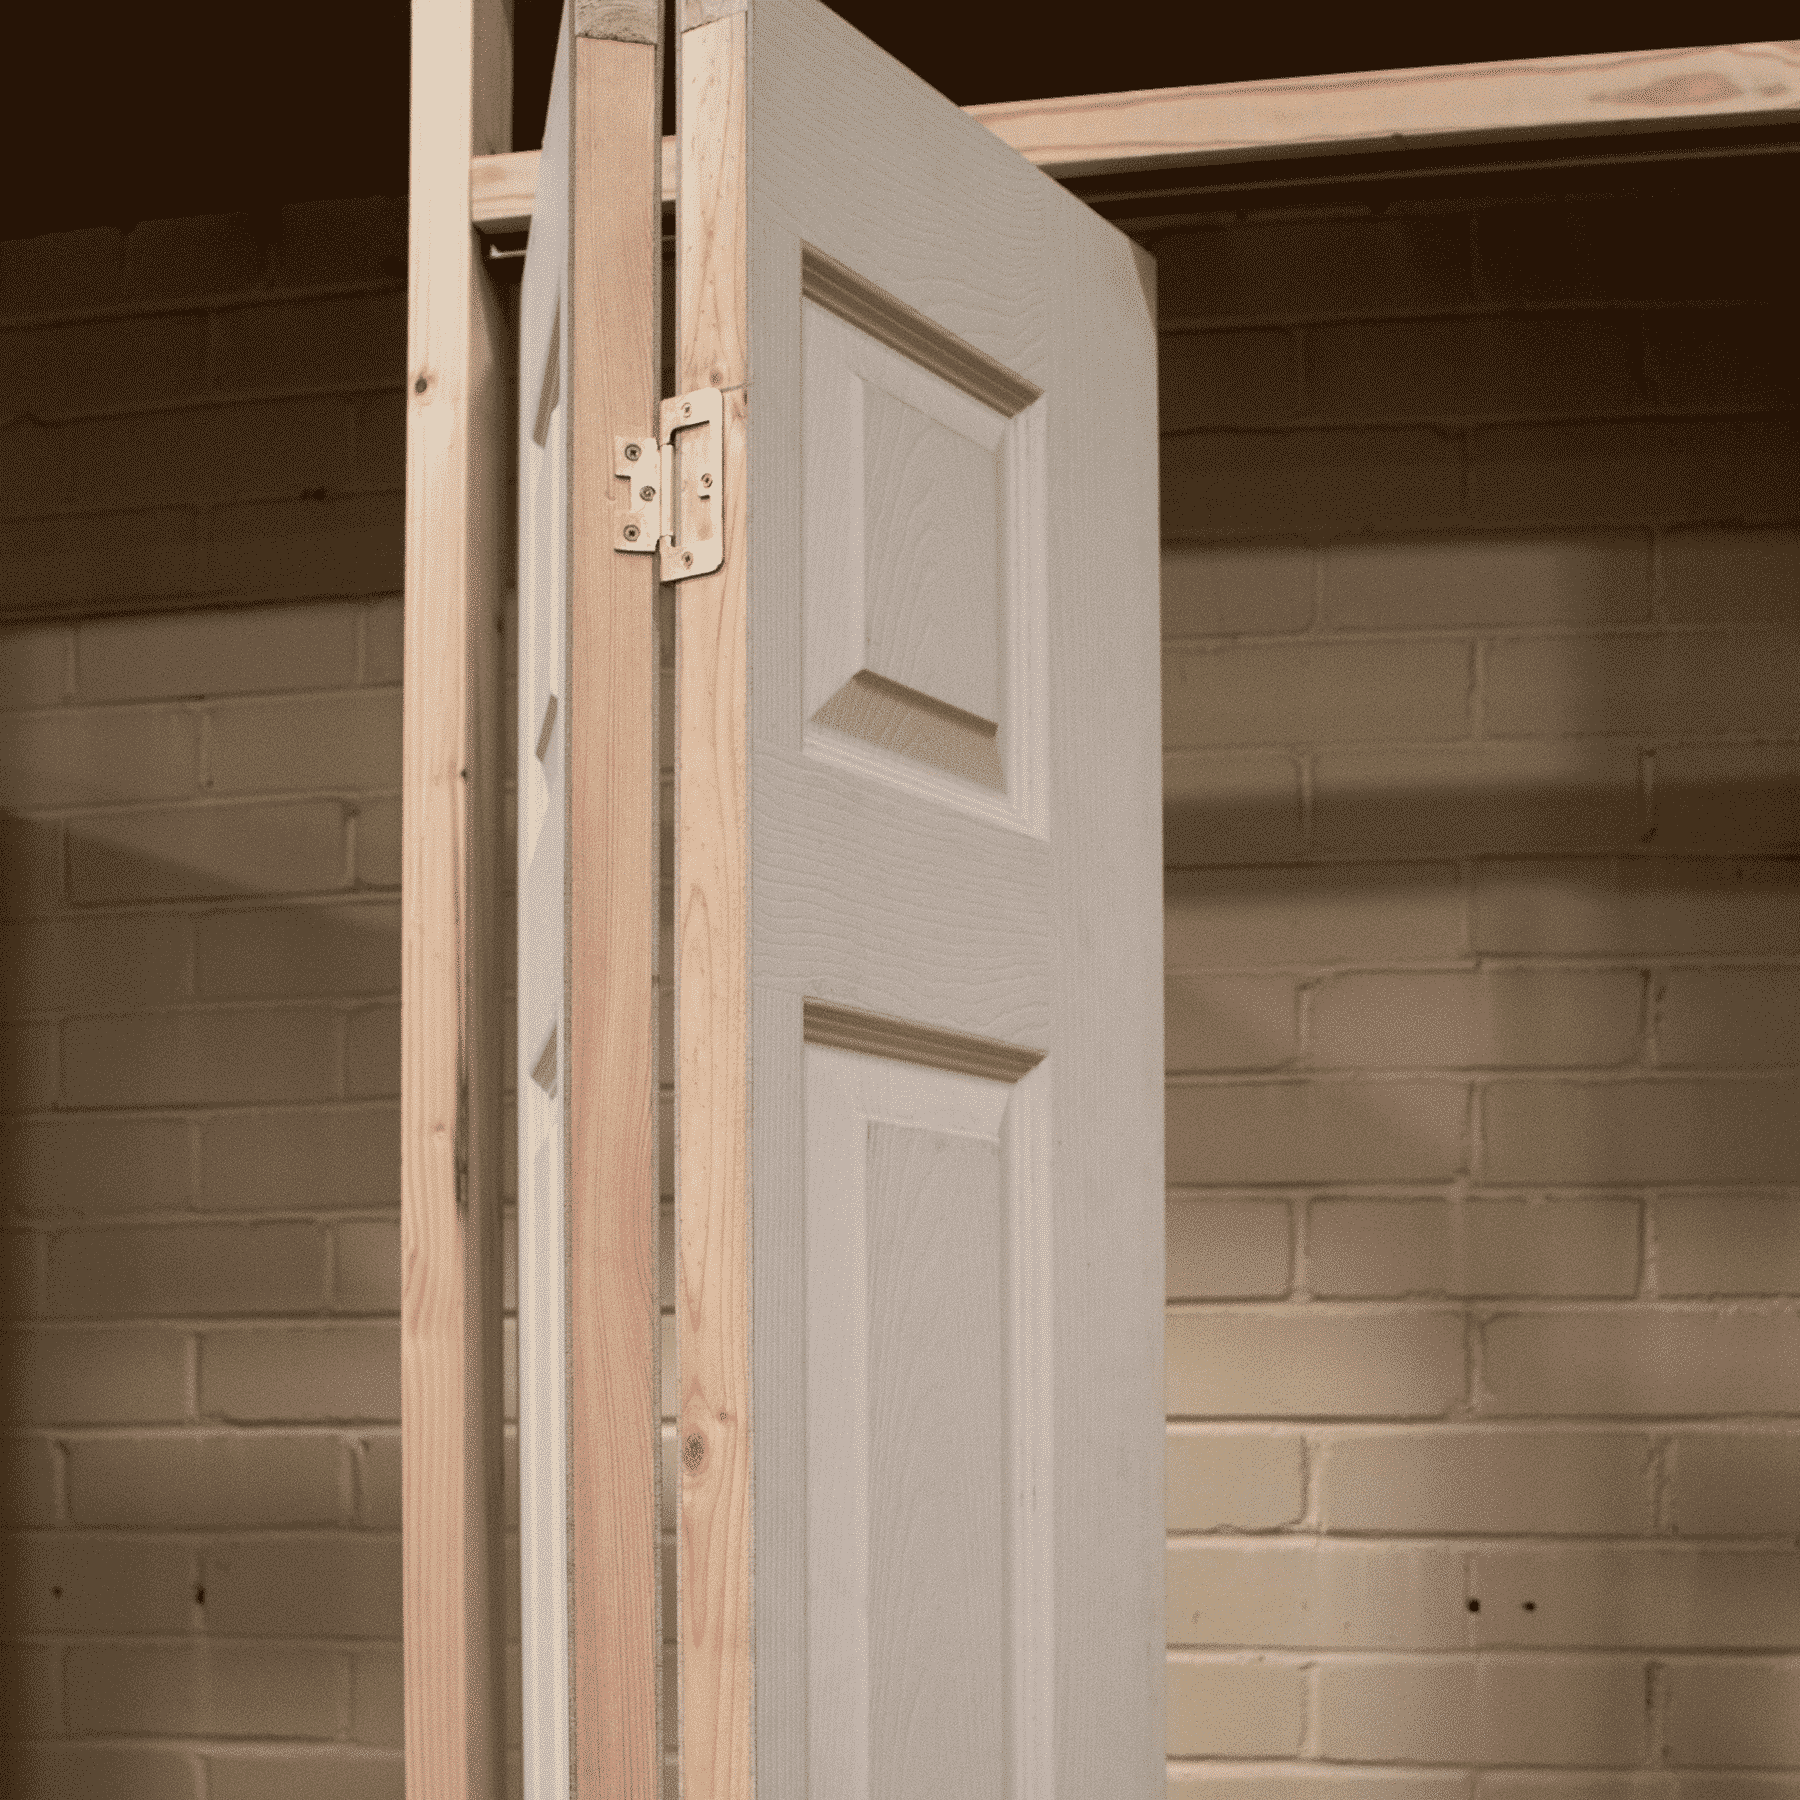 White Bifold Door Shaker 6 Panel With Kit Shawfield Doors